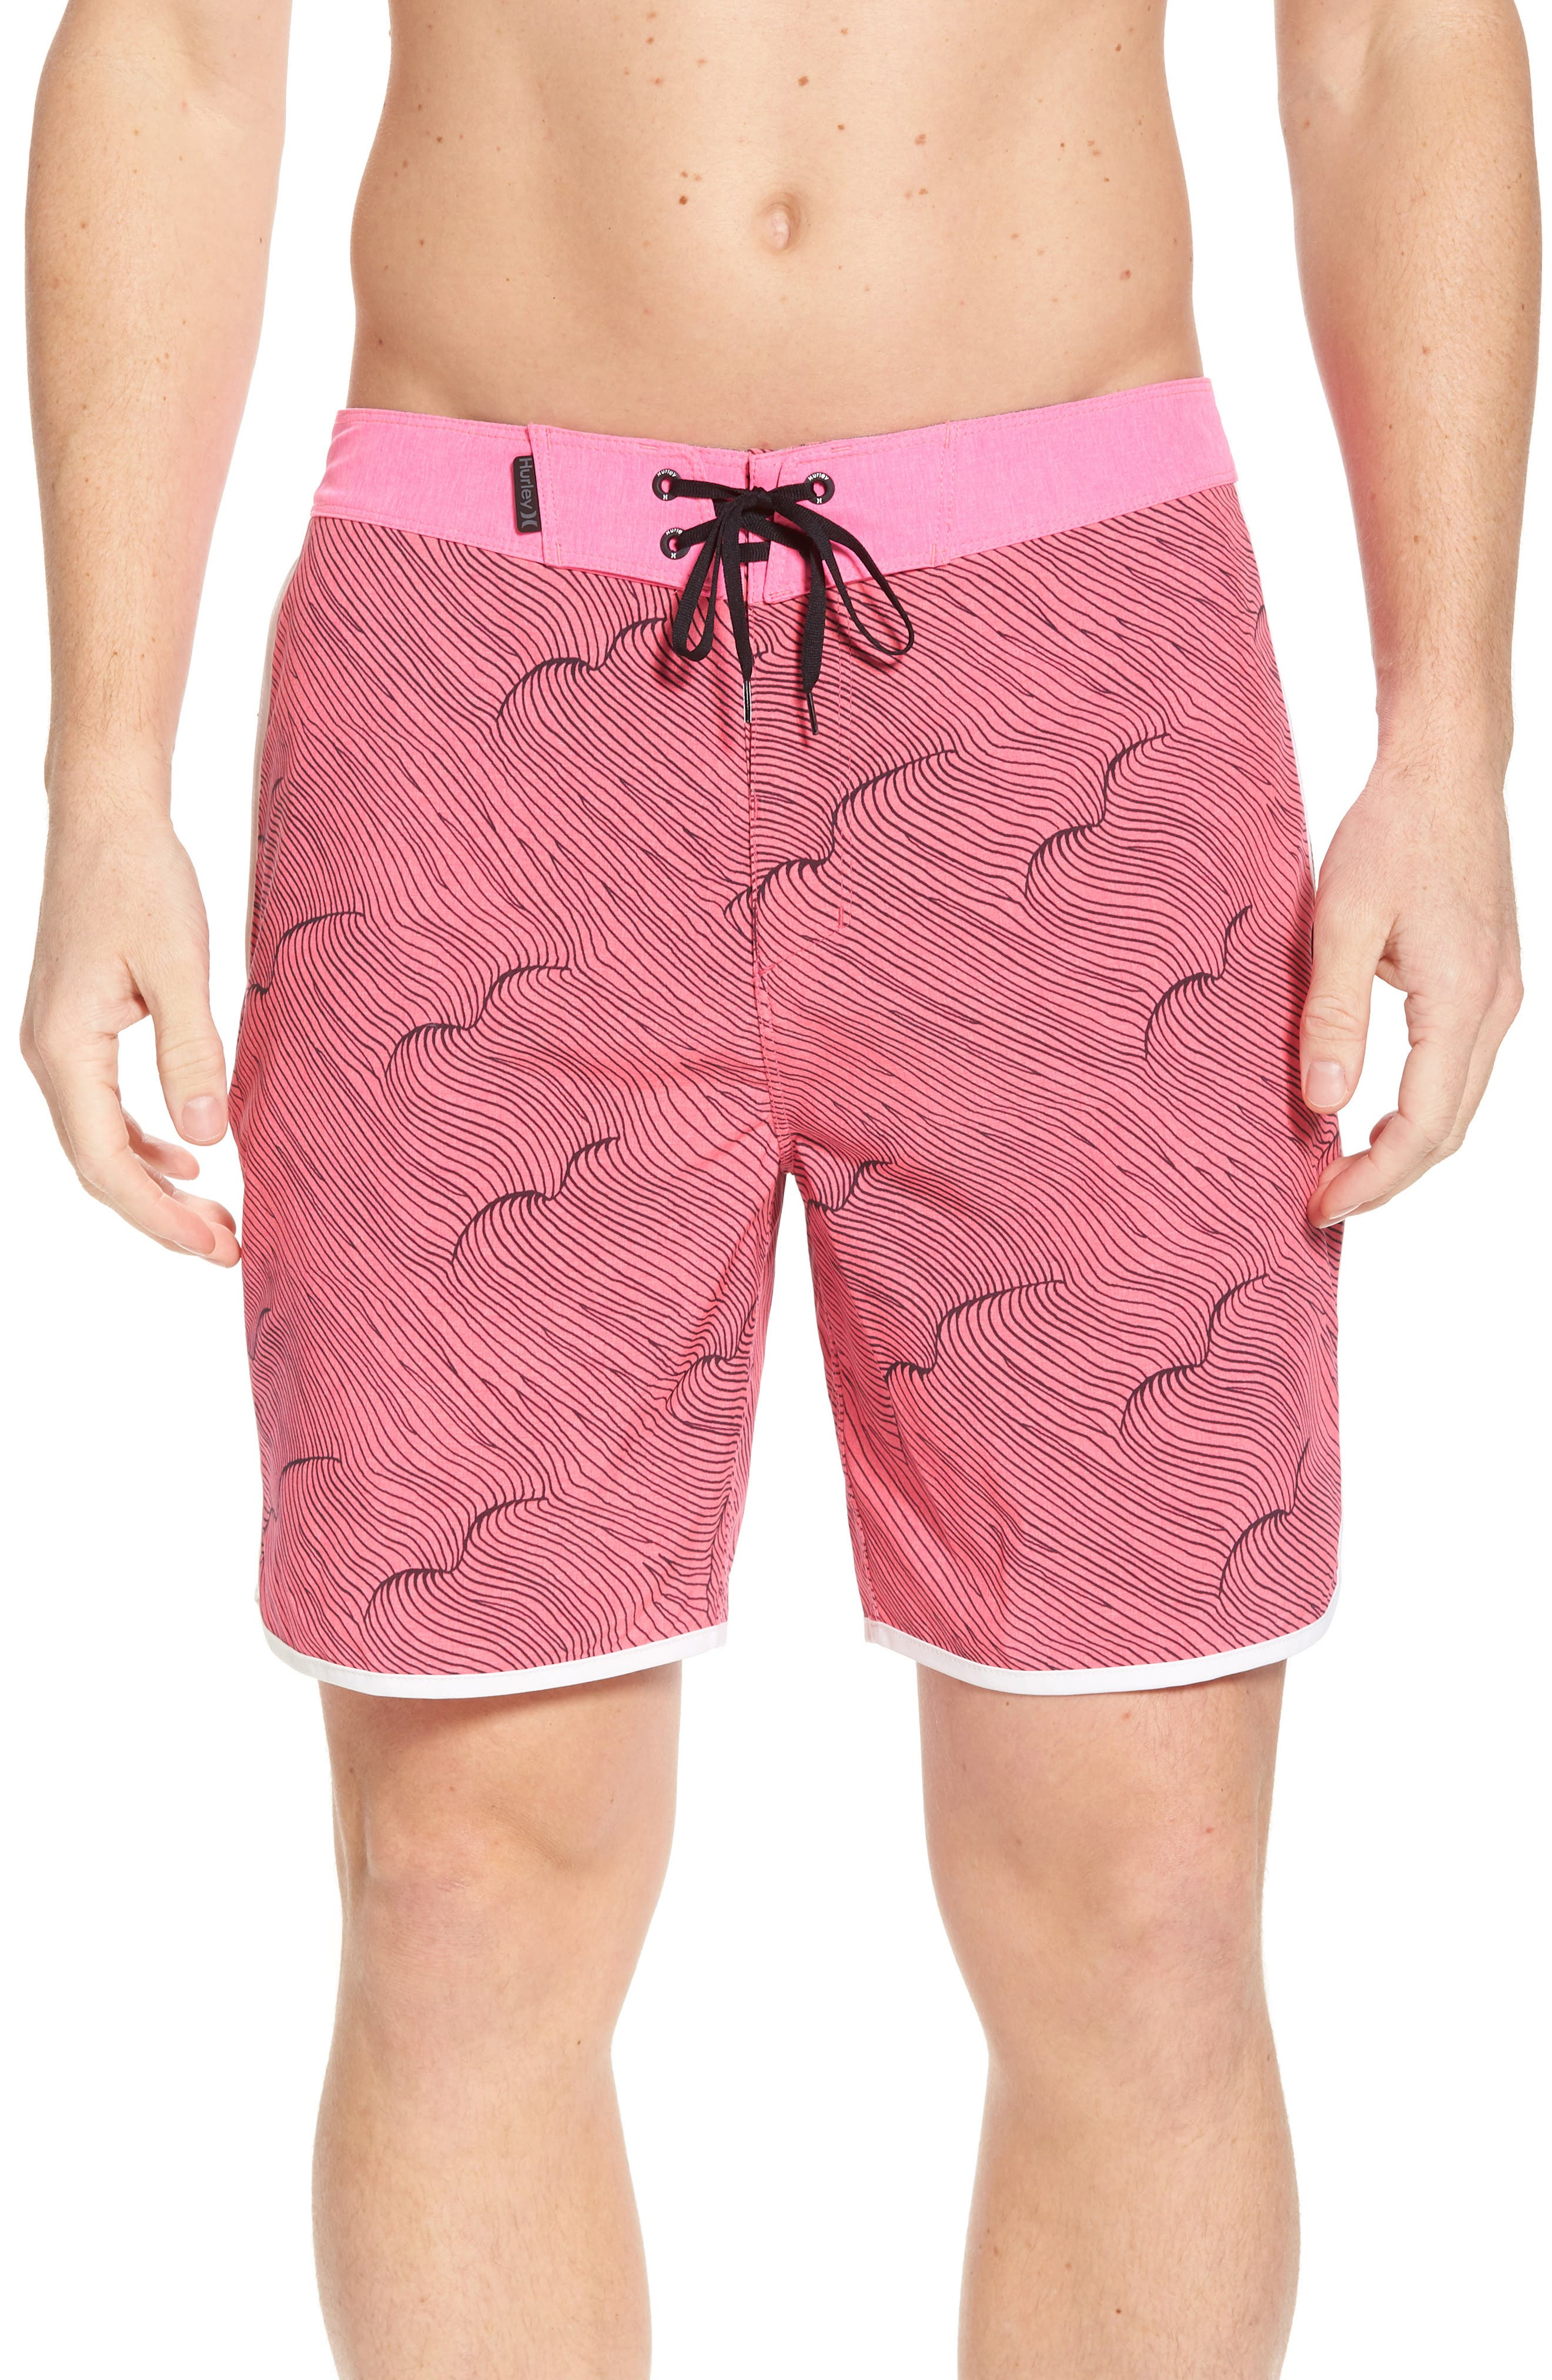 Phantom Thalia Street Board Shorts,                         Main,                         color, Hyper Pink/Black